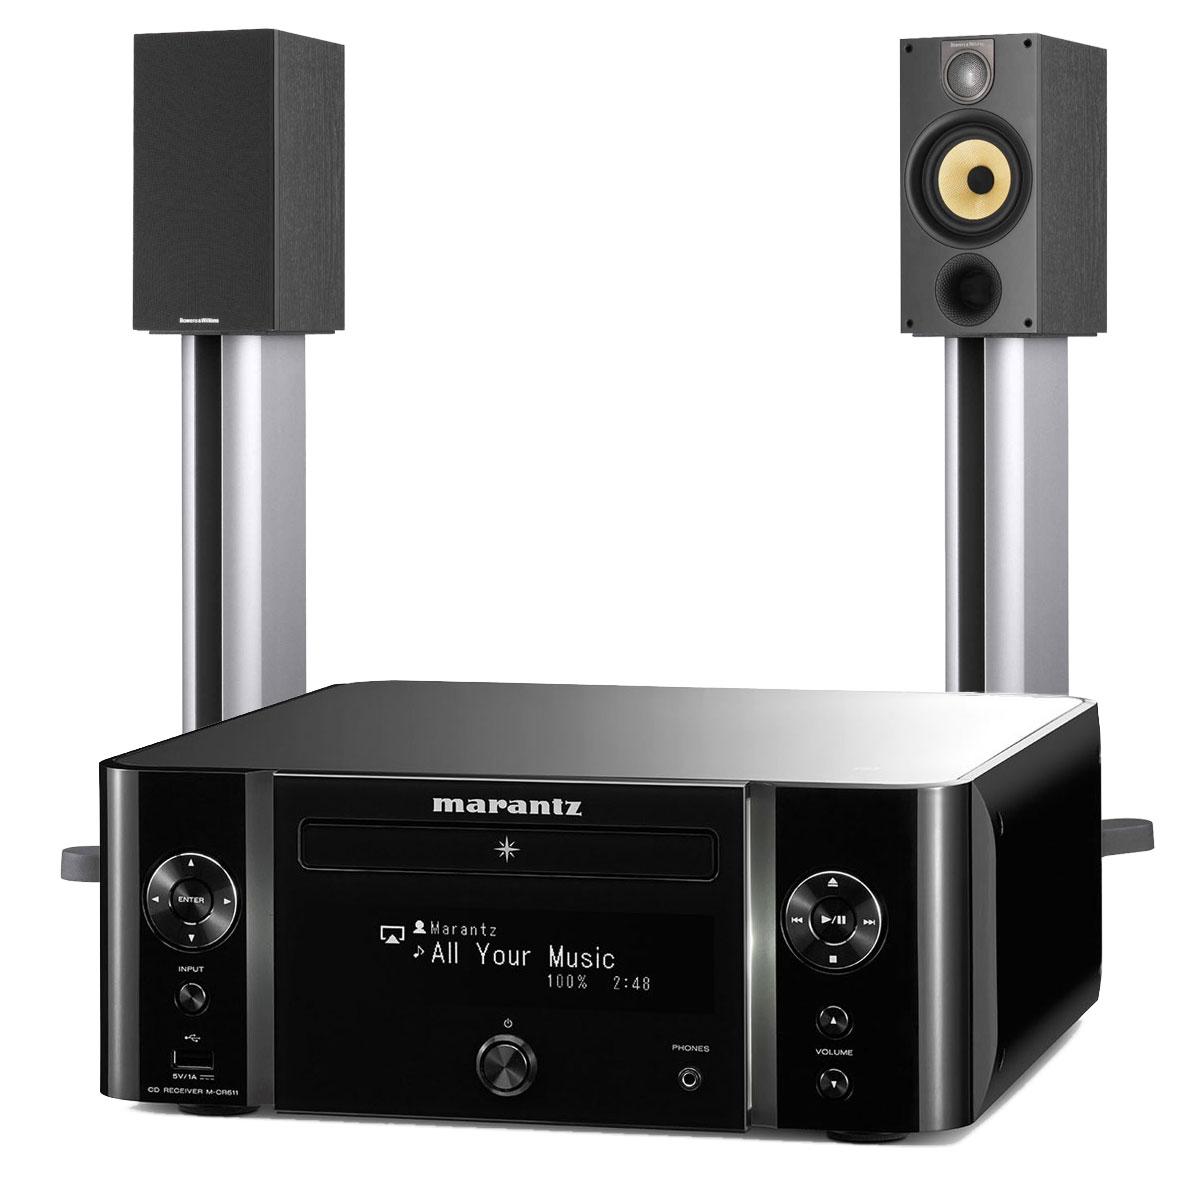 marantz melody stream m cr611 b w 686 s2 cha ne hifi marantz sur. Black Bedroom Furniture Sets. Home Design Ideas